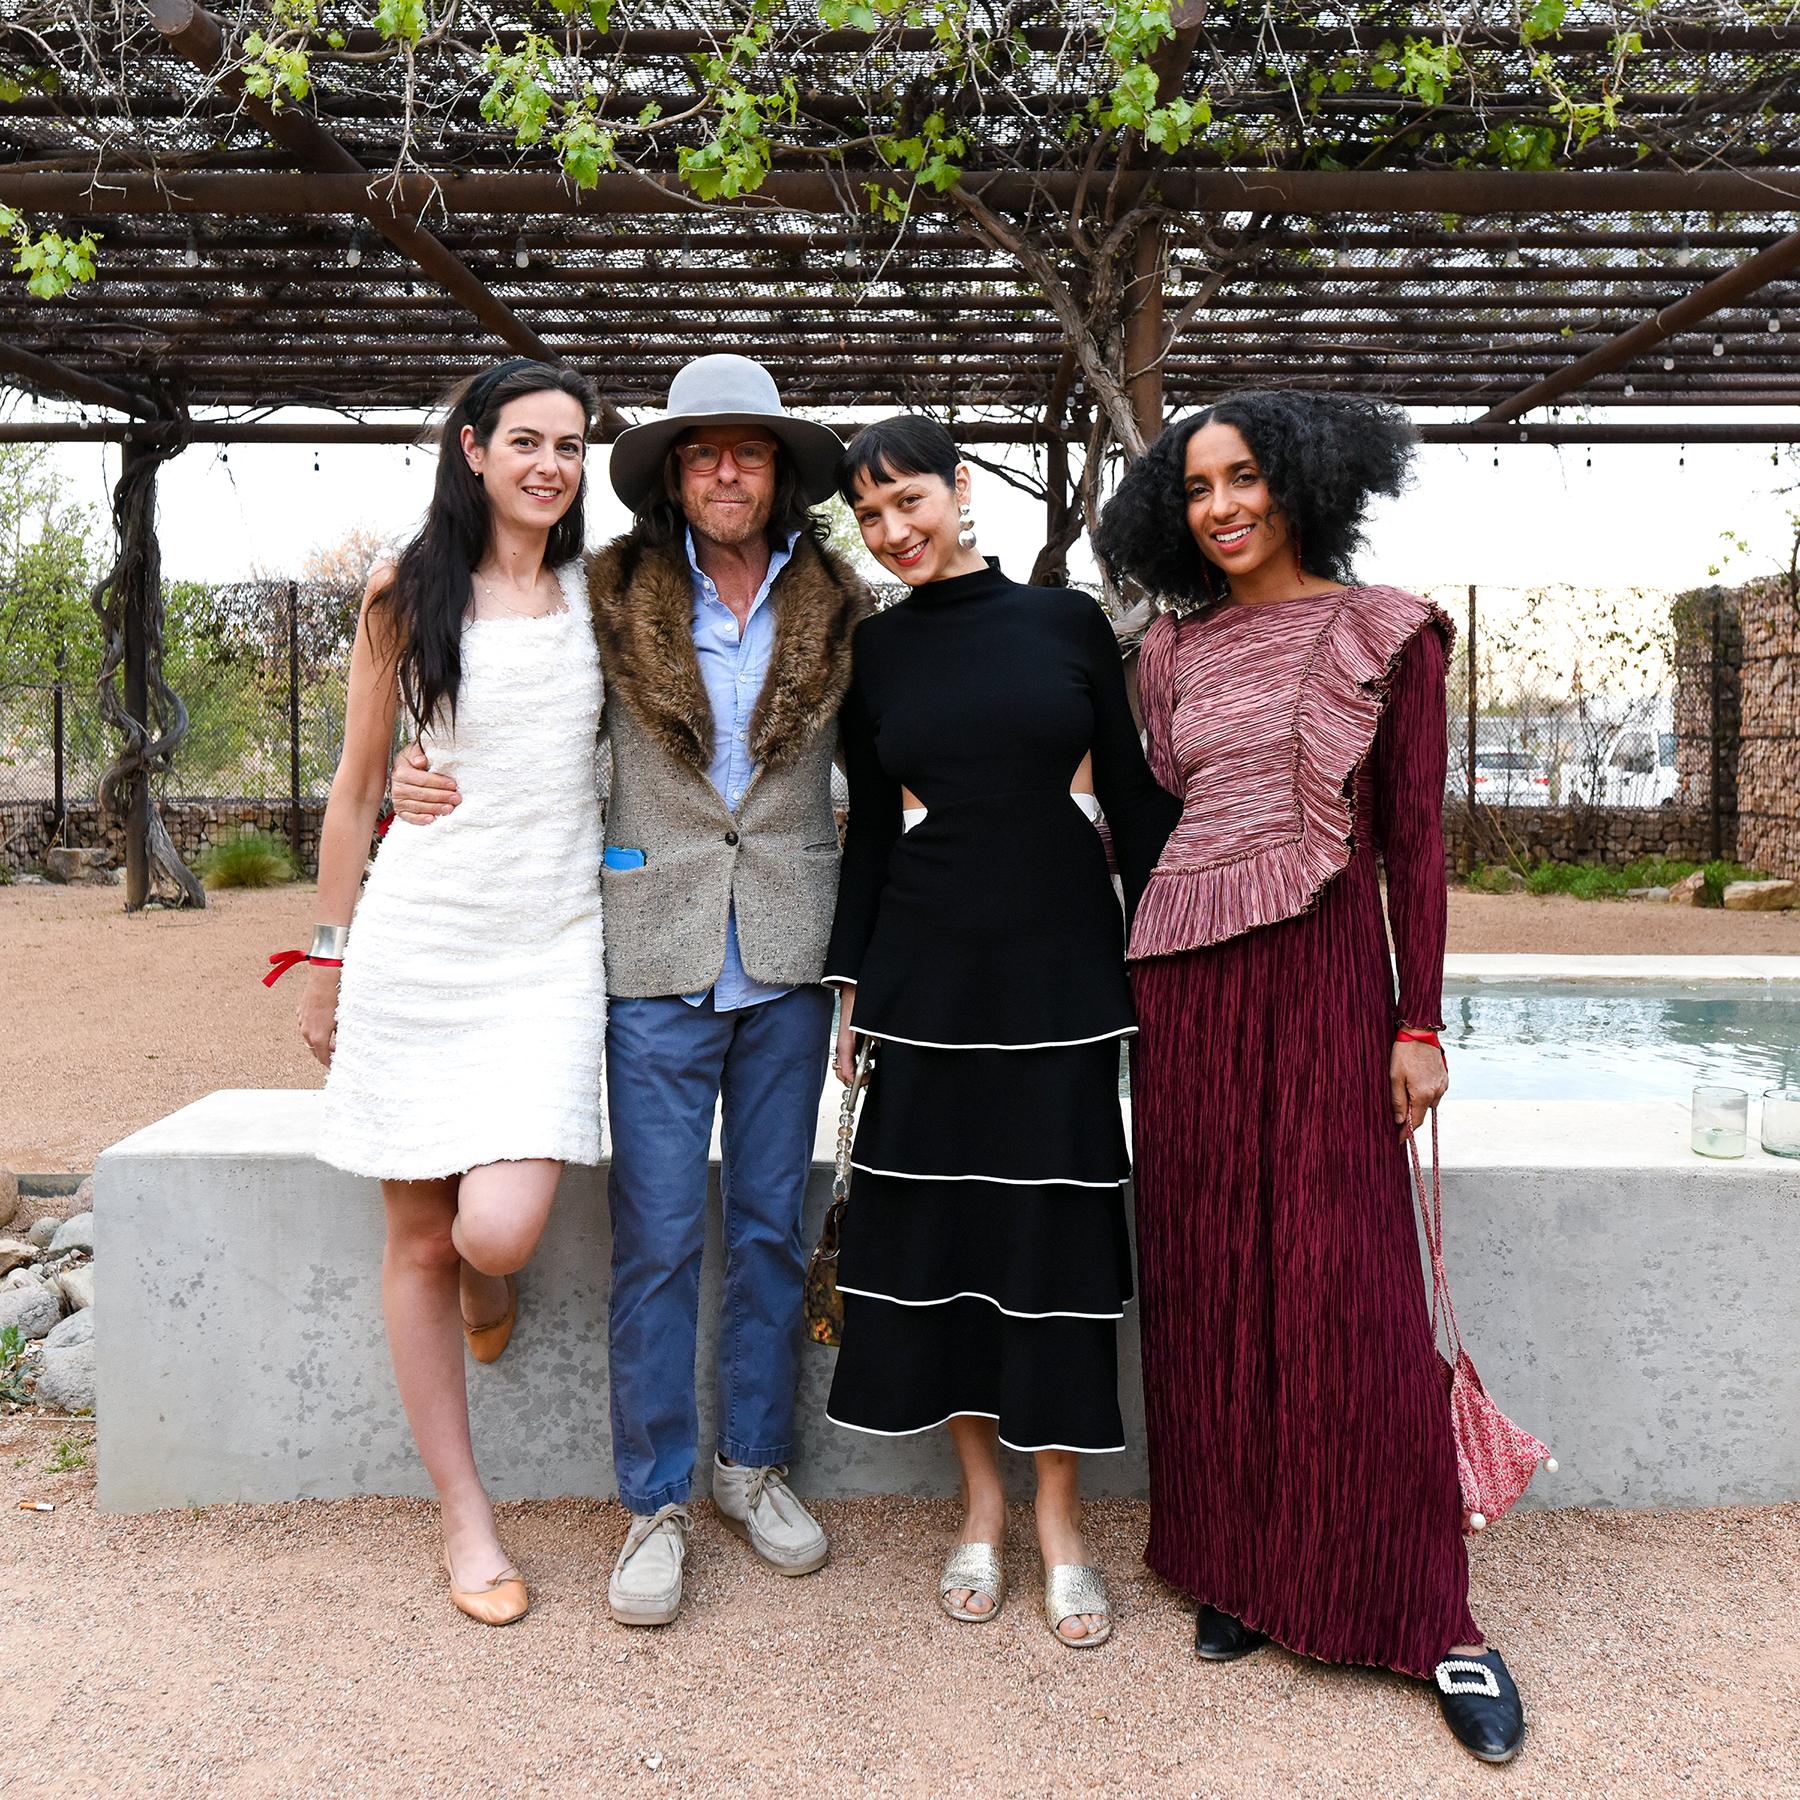 MI COCKTAIL RECEPTION + DINNER   THE CAPRI   MARFA  Malissa Bent, Michael Phelan, Amanda Carter, Chioma NNadi